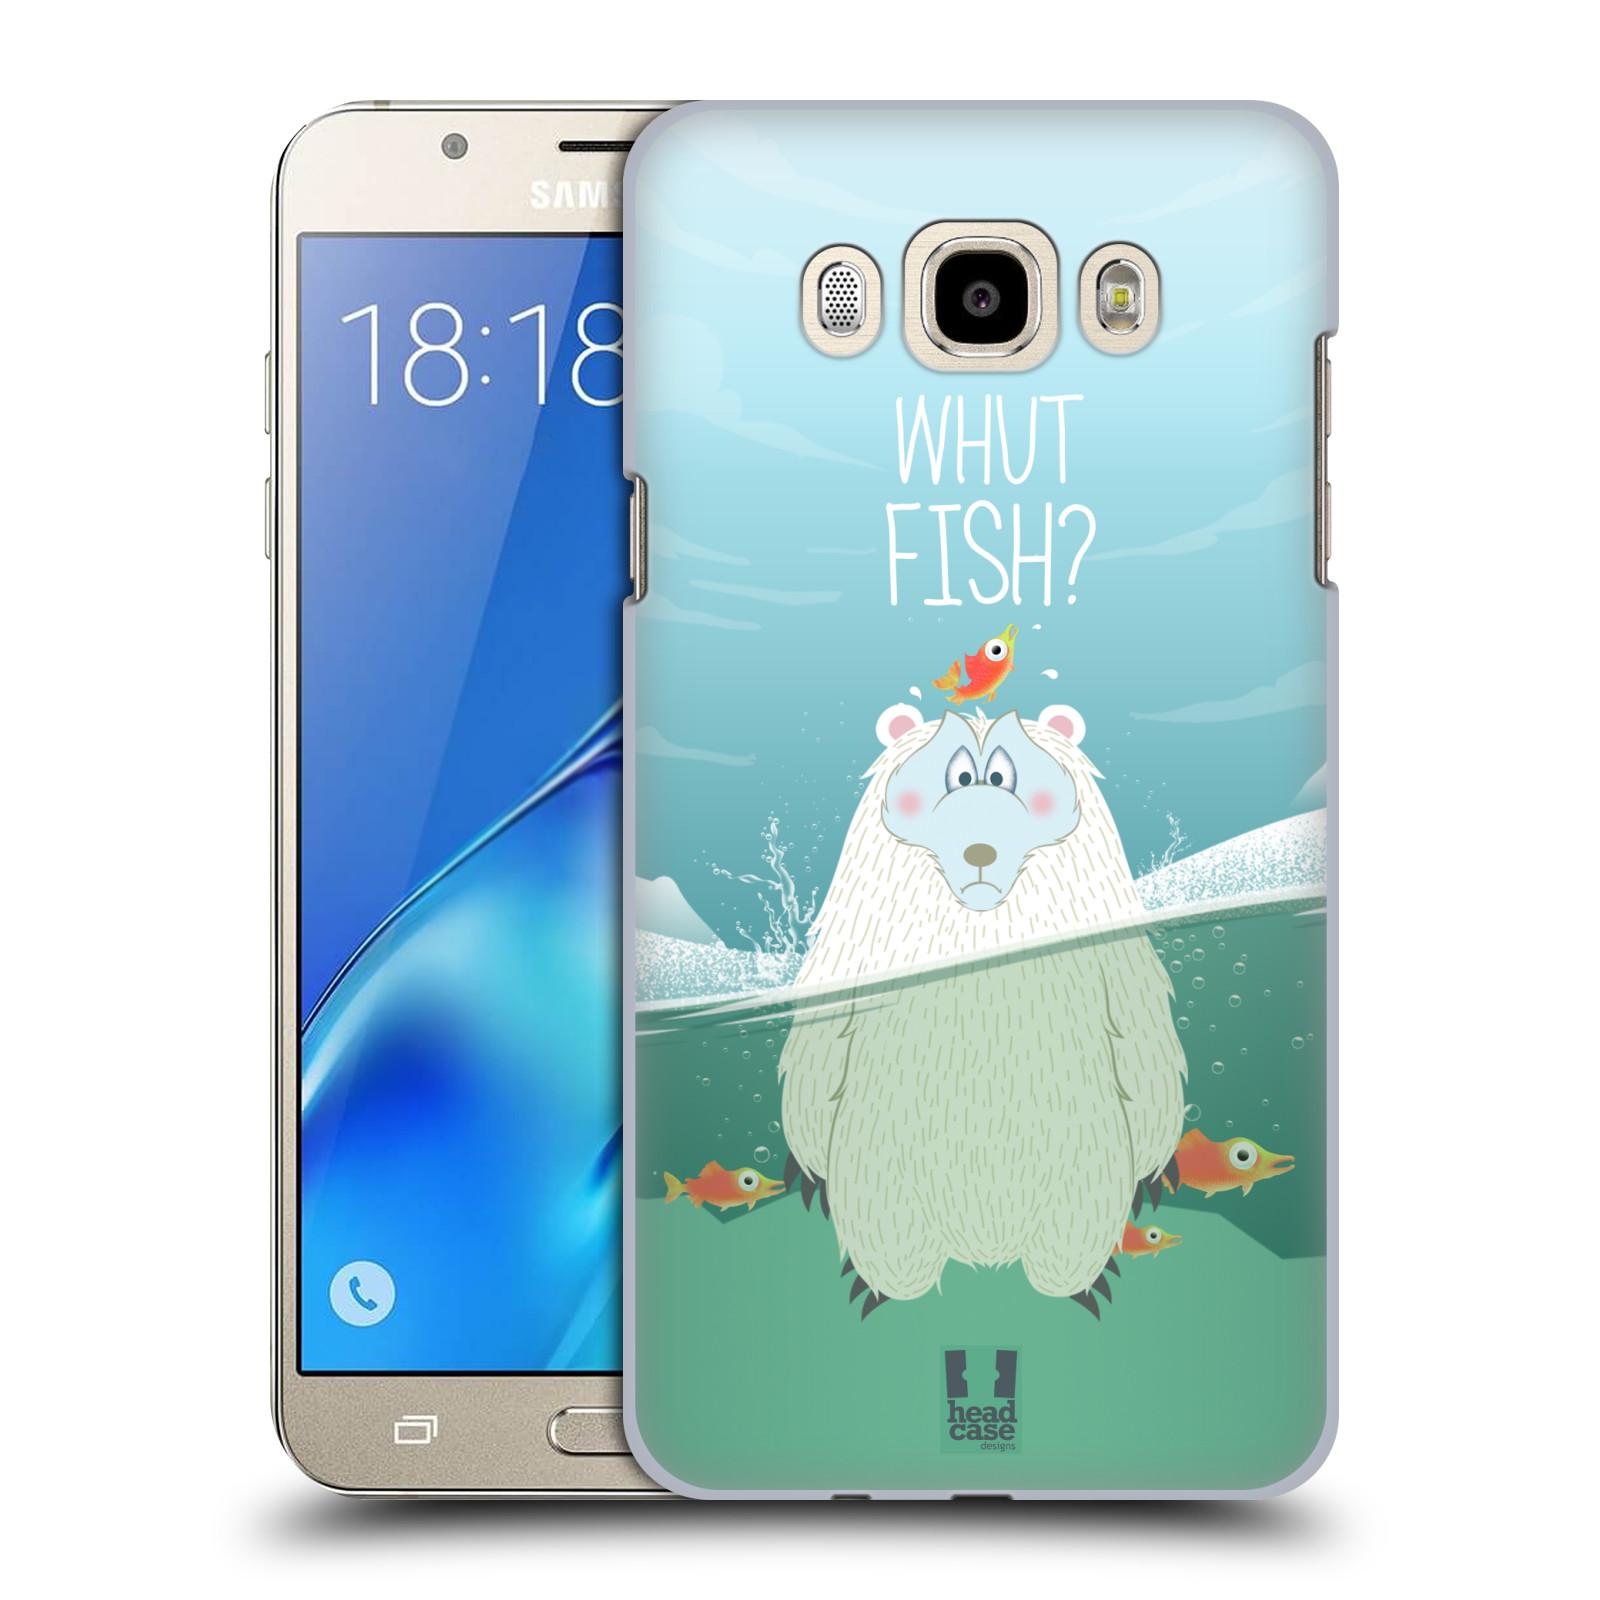 Plastové pouzdro na mobil Samsung Galaxy J7 (2016) HEAD CASE Medvěd Whut Fish?